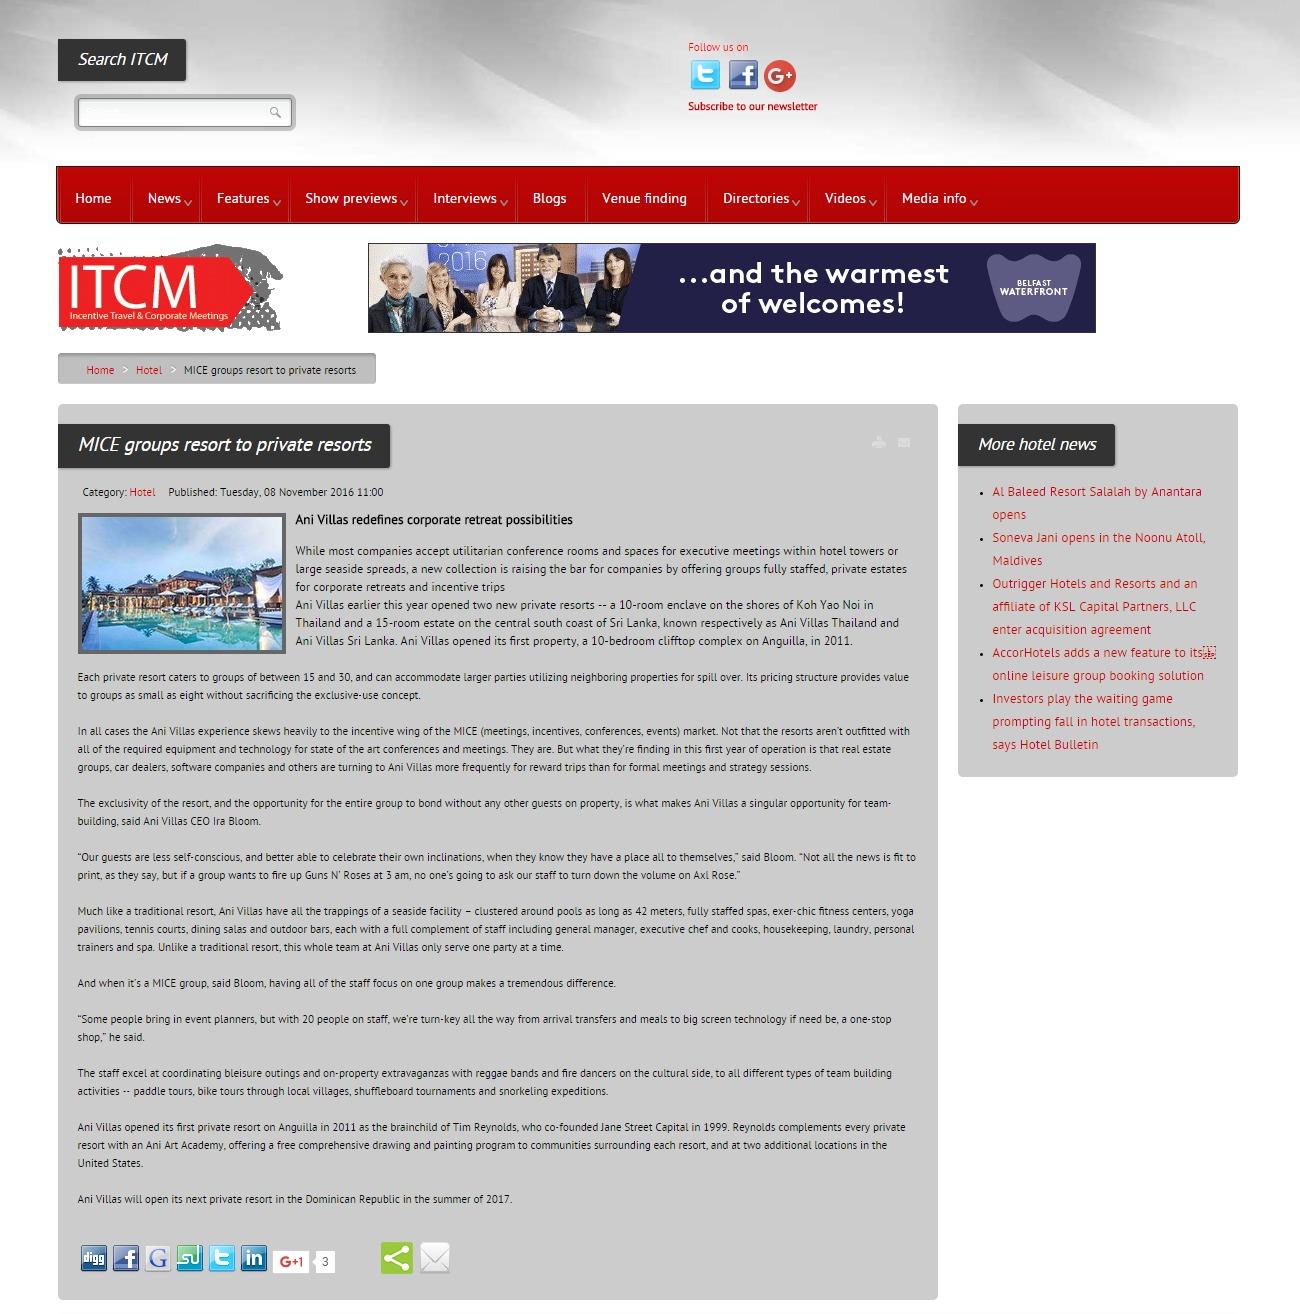 2016.11.08.ITCM_Page_1_Image_0001.jpg